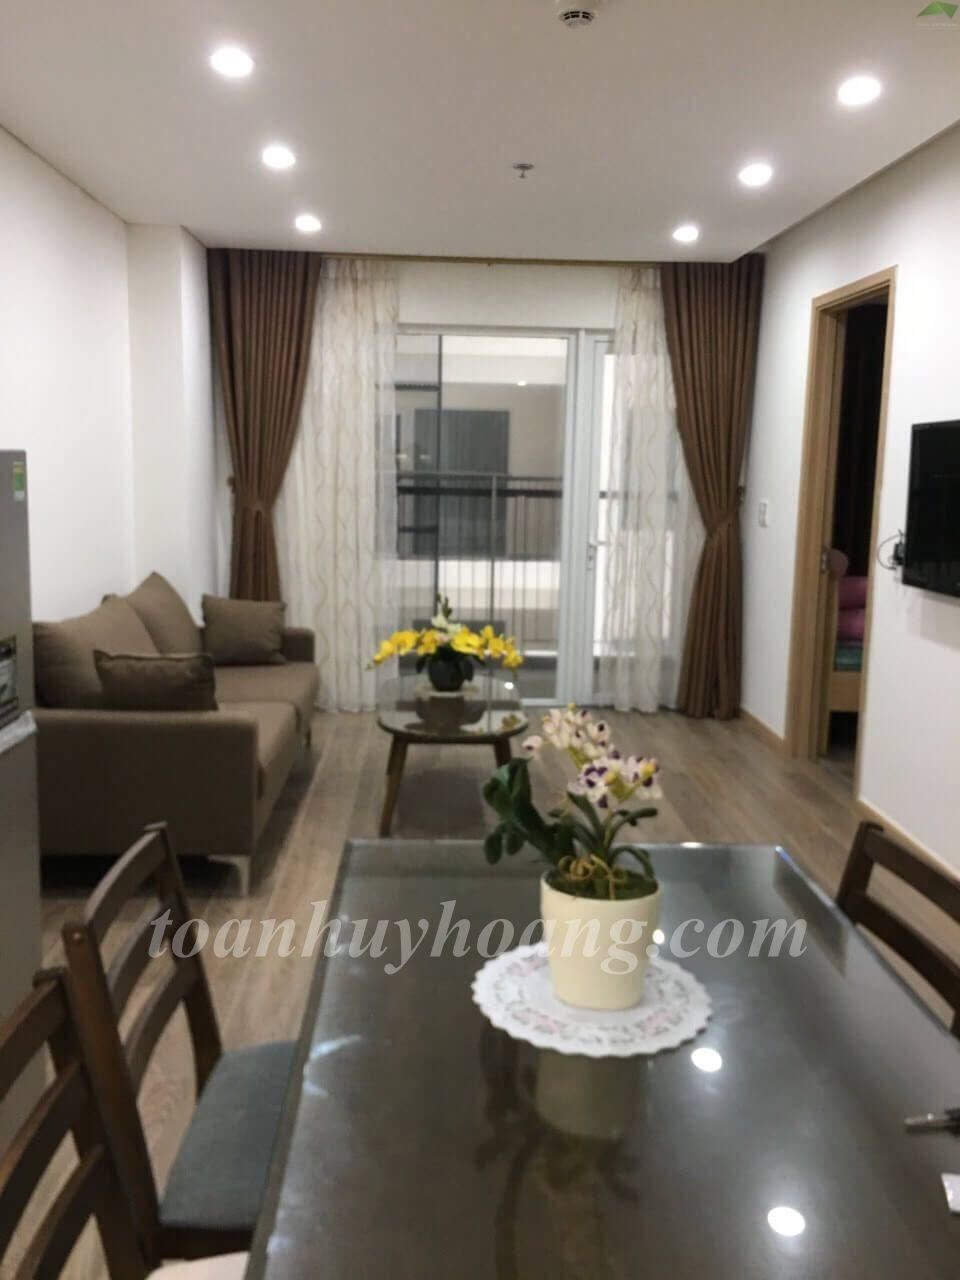 Apartment in center city rental